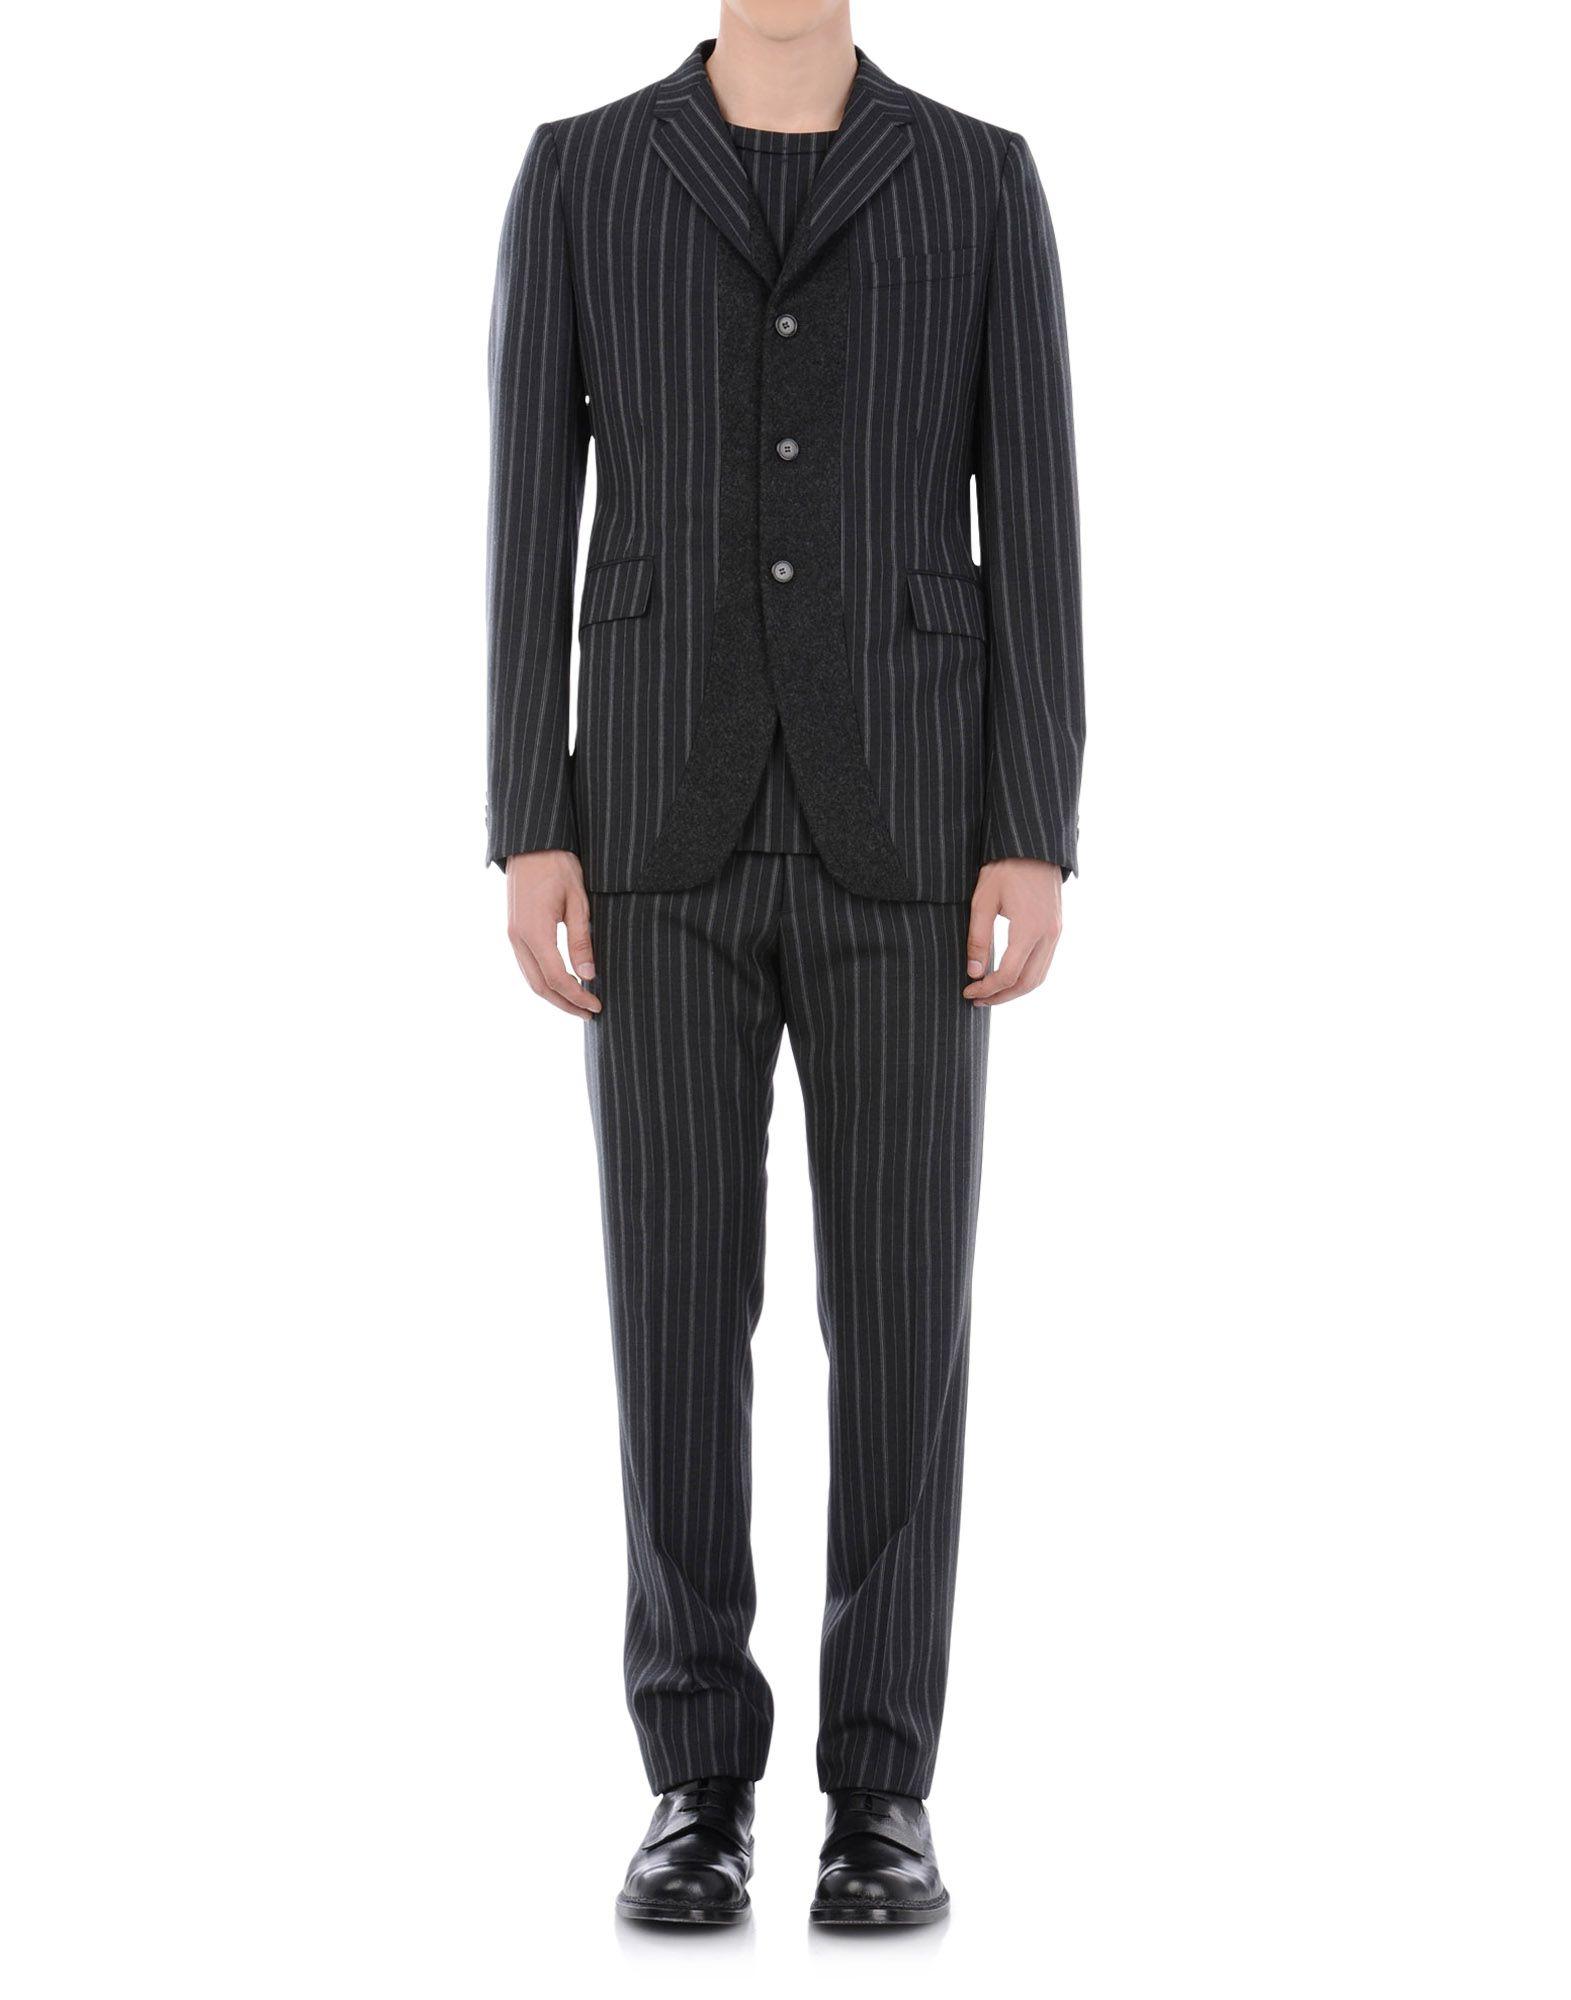 Tailored pant - JIL SANDER Online Store